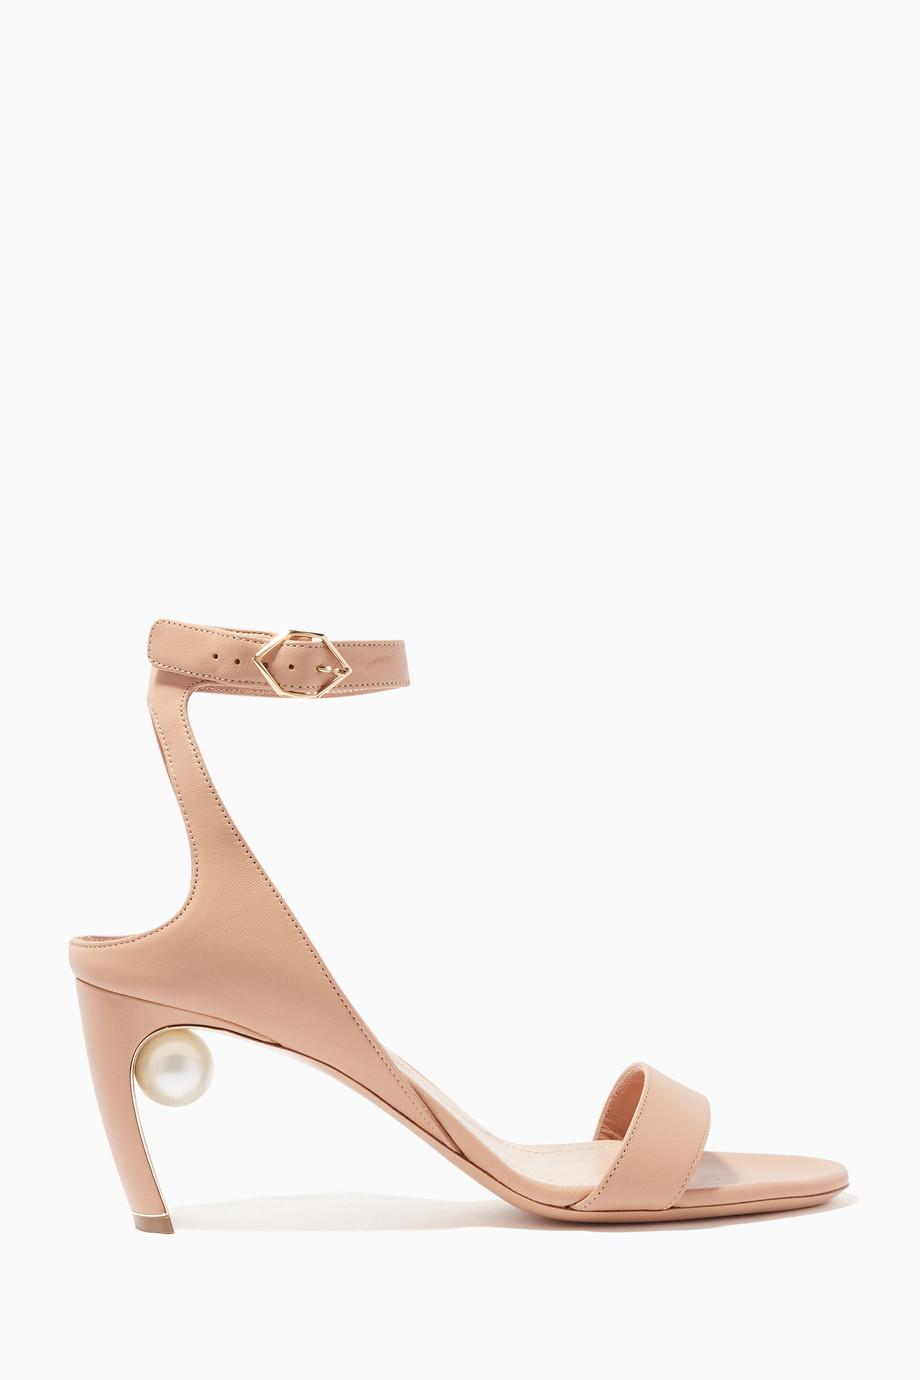 ffdbd933151b Shop Nicholas Kirkwood Neutral Beige Lola Pearl Sandals for Women ...